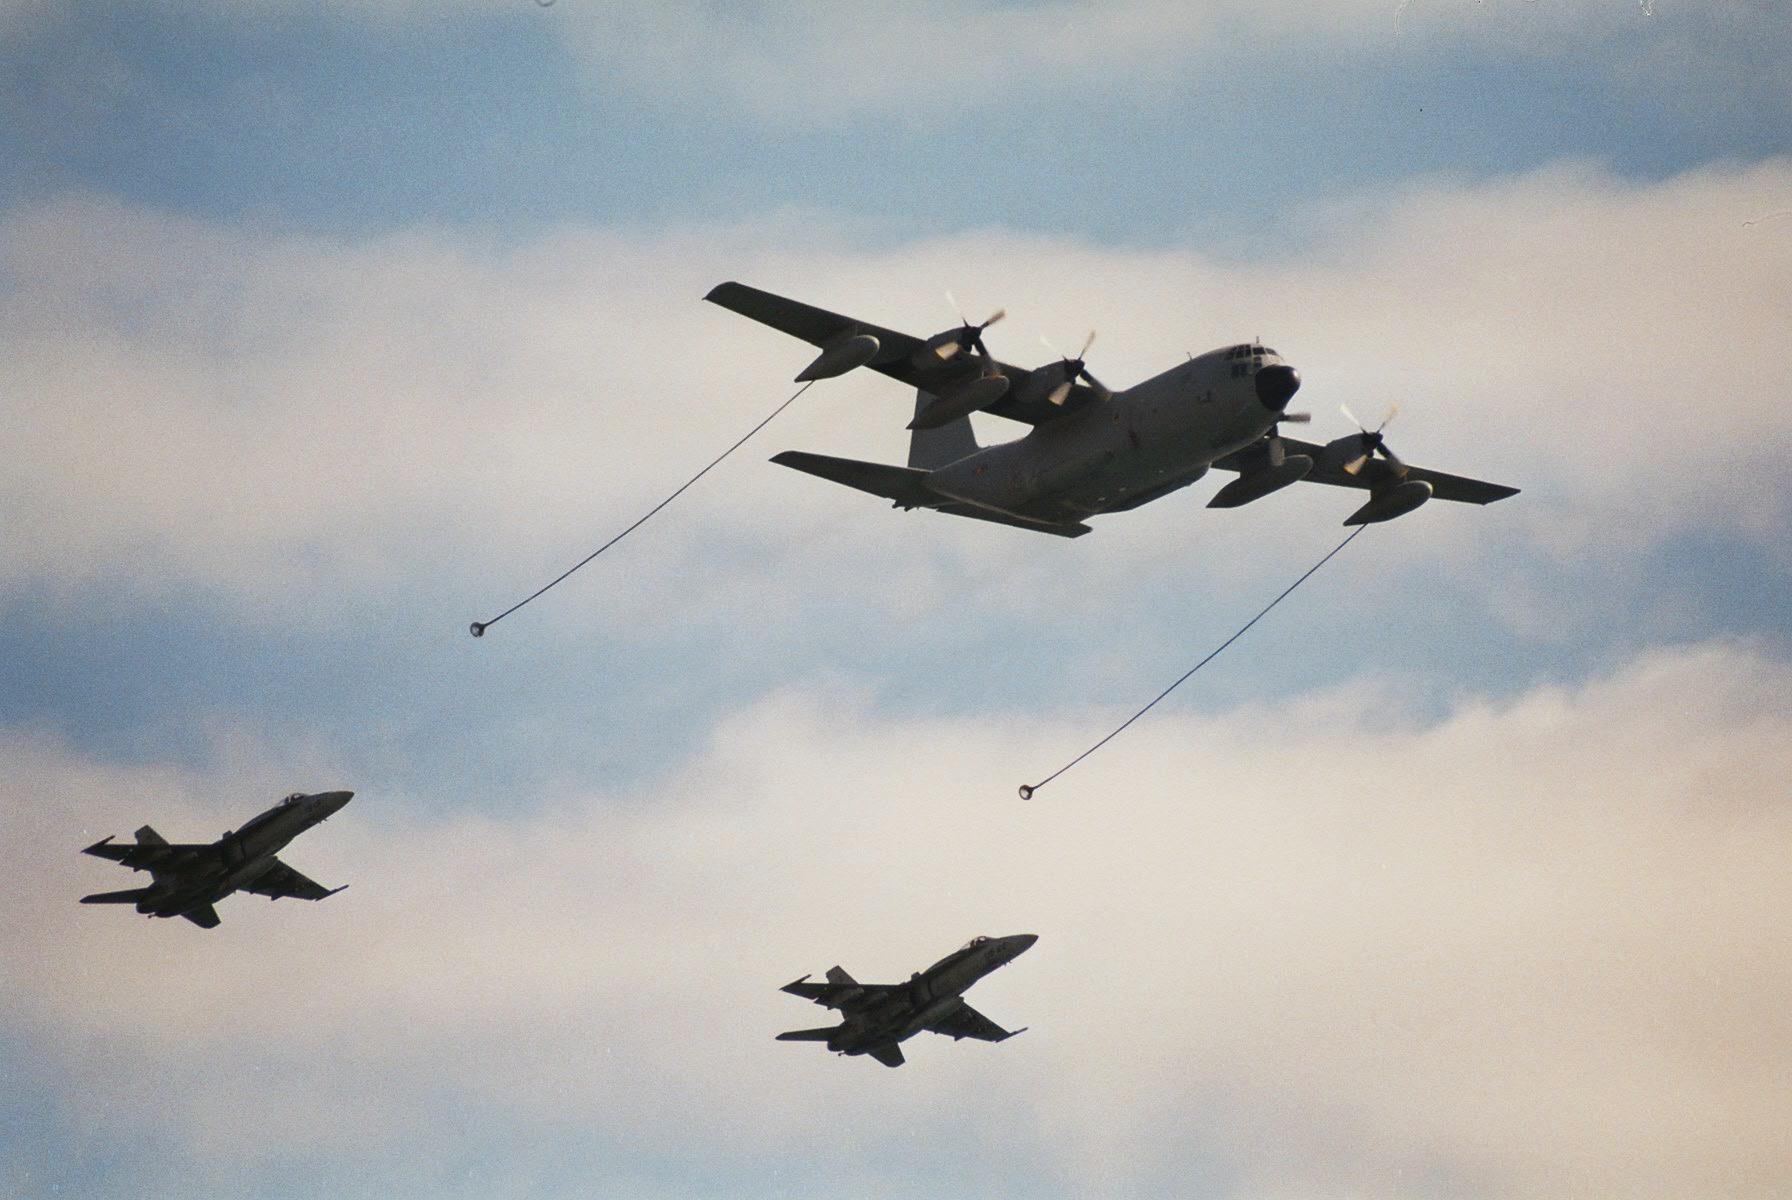 File:Spanish KC-130H and F-18.jpg - Wikipedia